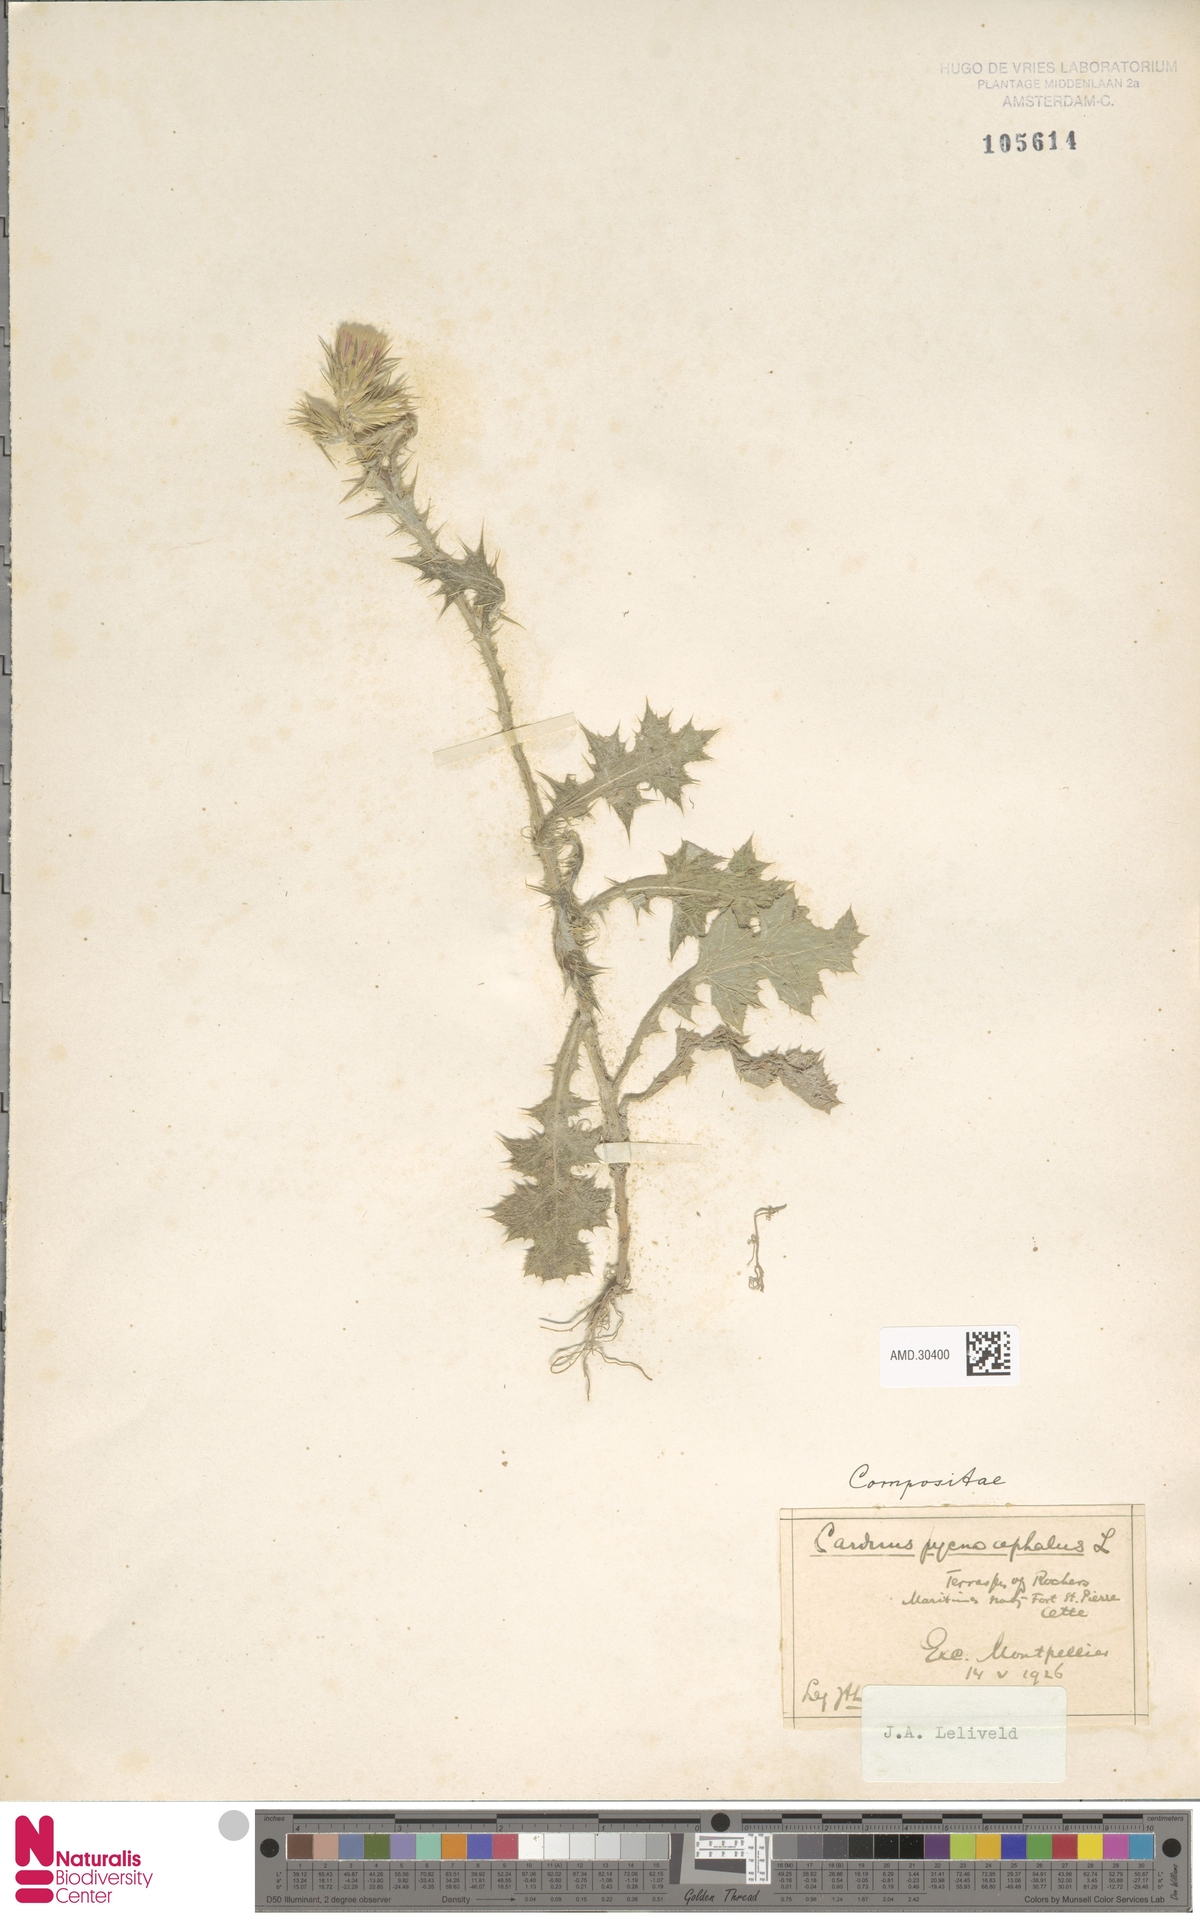 AMD.30400 | Carduus pycnocephalus L.